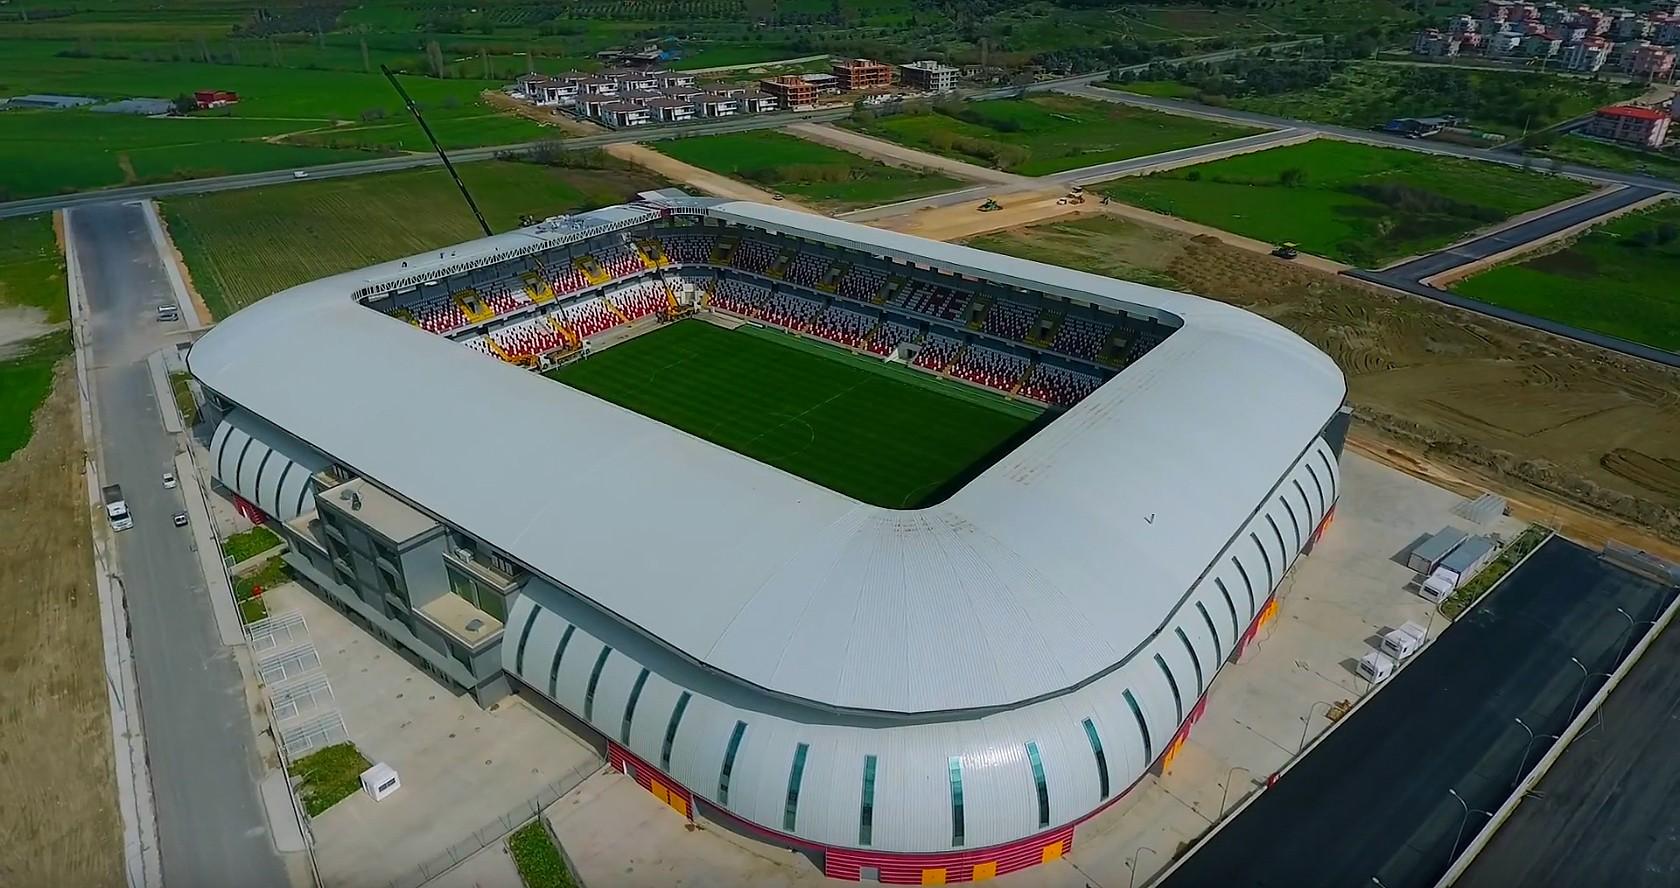 Tire Ataturk Stadyumu